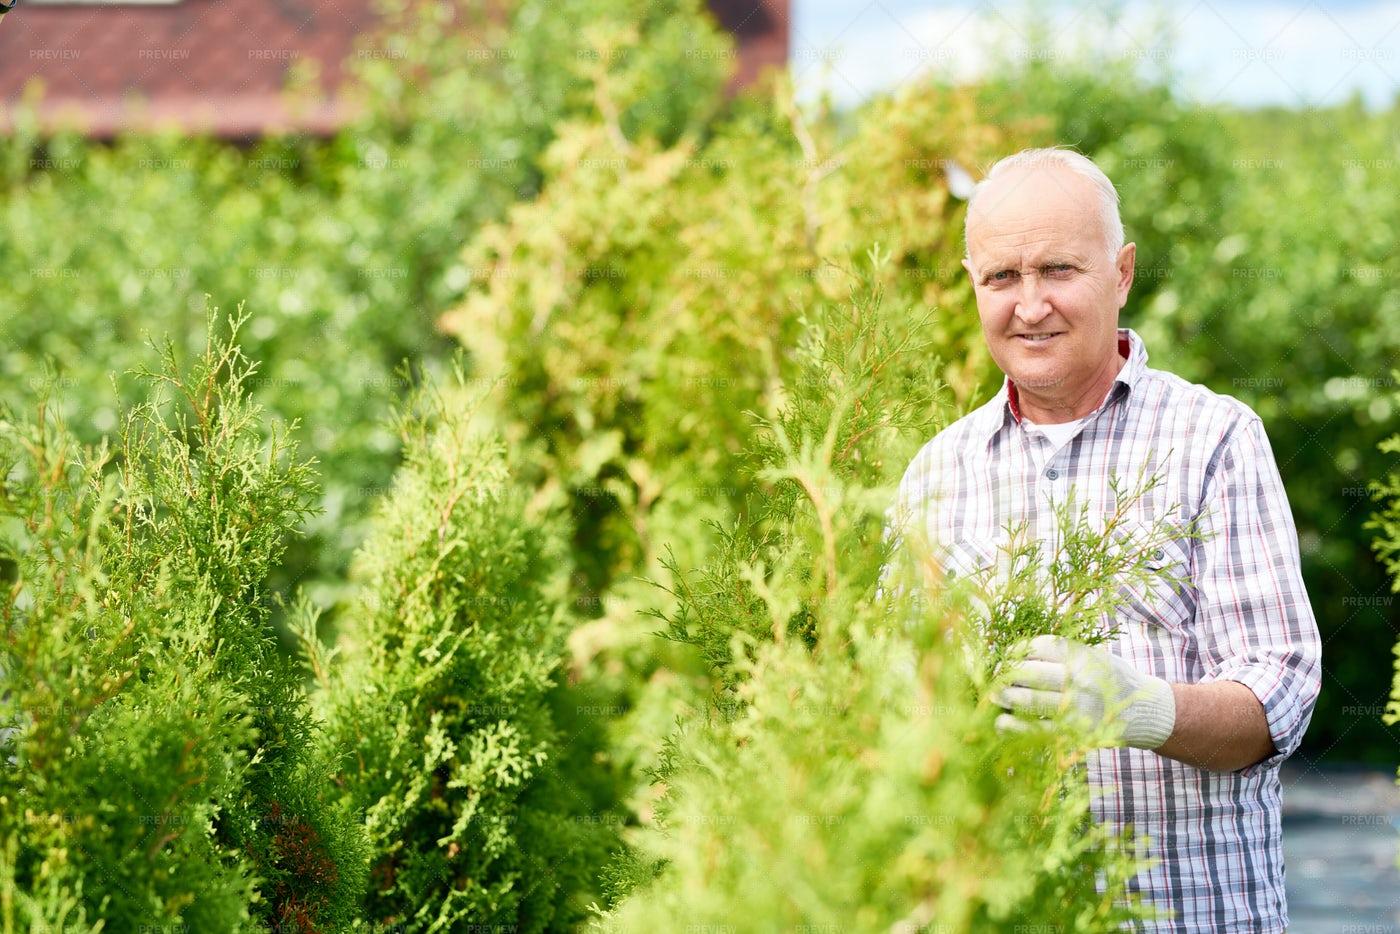 Nice Old Man Working In Garden: Stock Photos